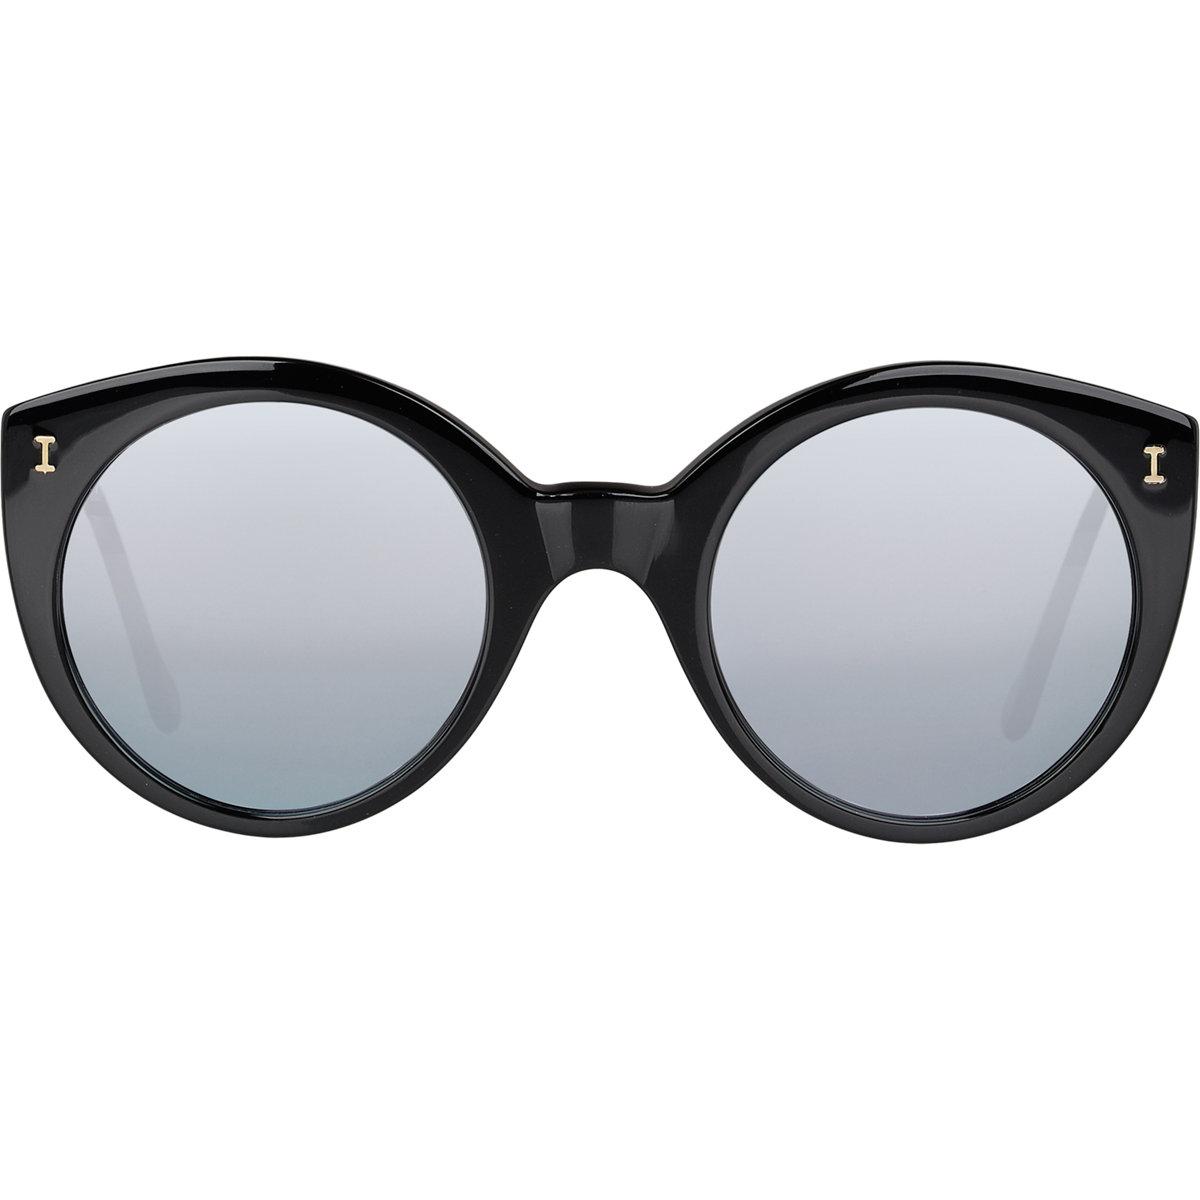 Lyst illesteva women 39 s palm beach mirrored sunglasses in for Mirror sunglasses